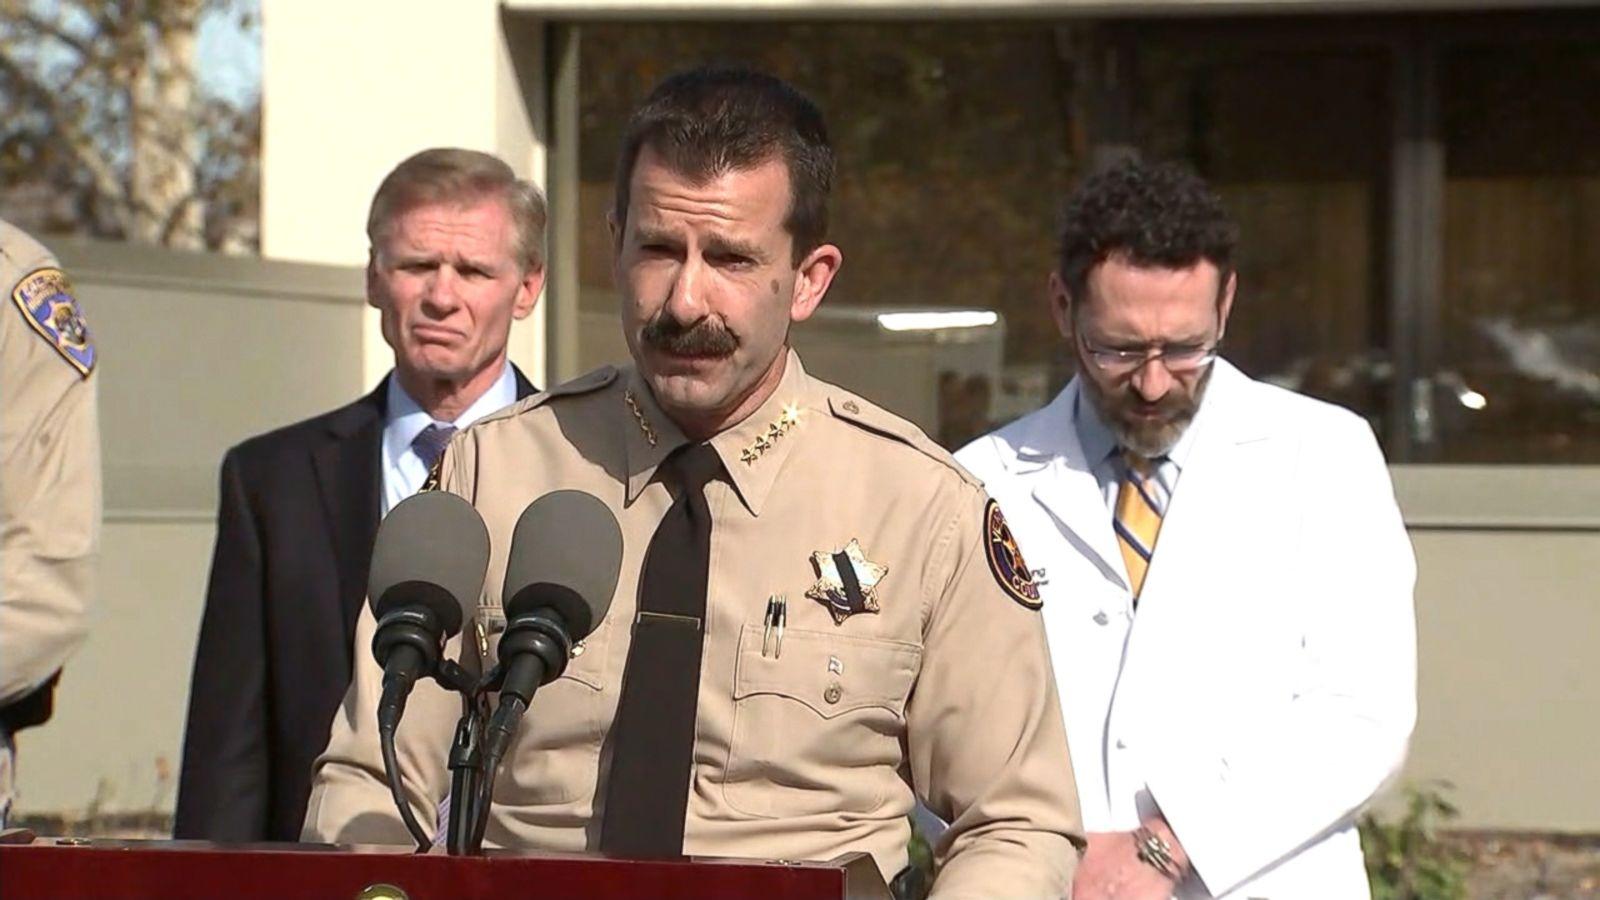 Watch Details emerge about Thousand Oaks gunman, but motive still a mystery video